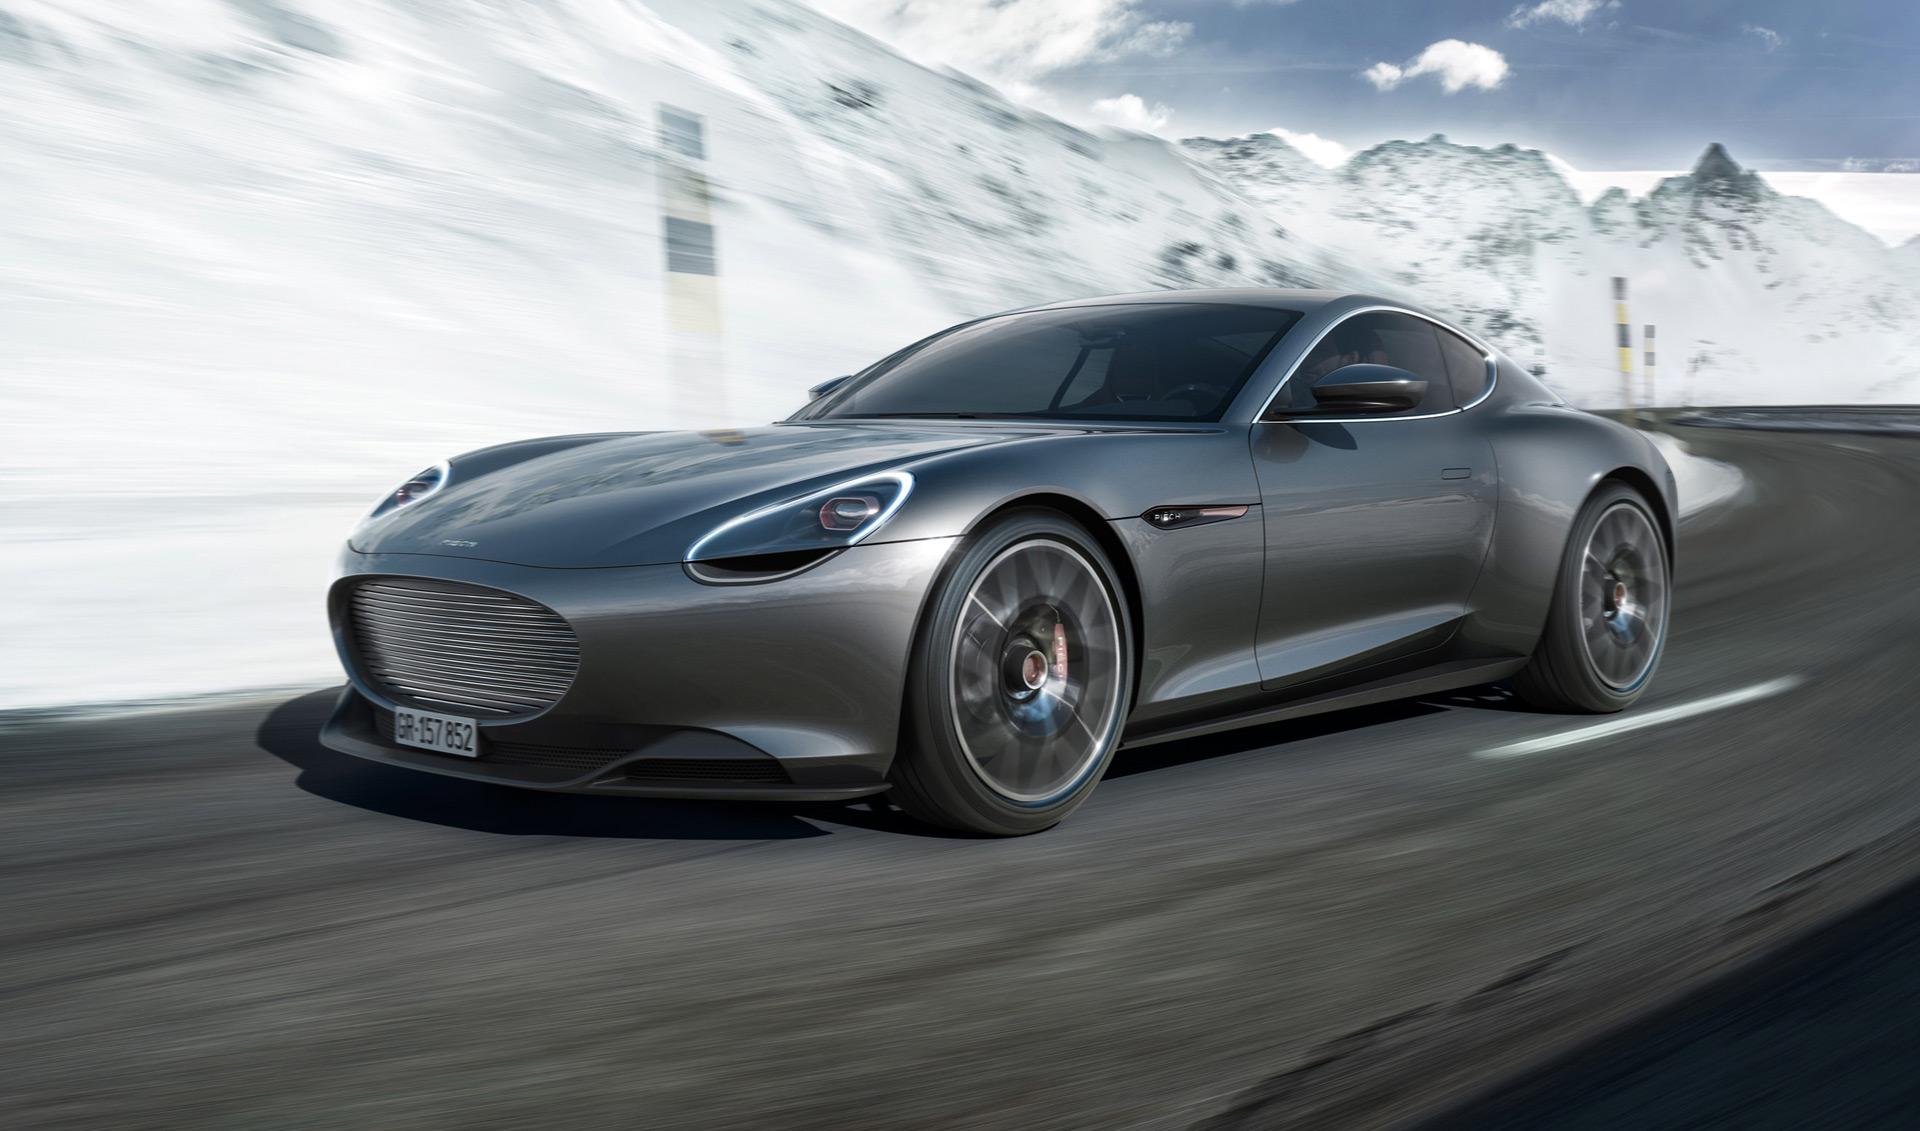 Piech family member starts car brand, plans electric ...